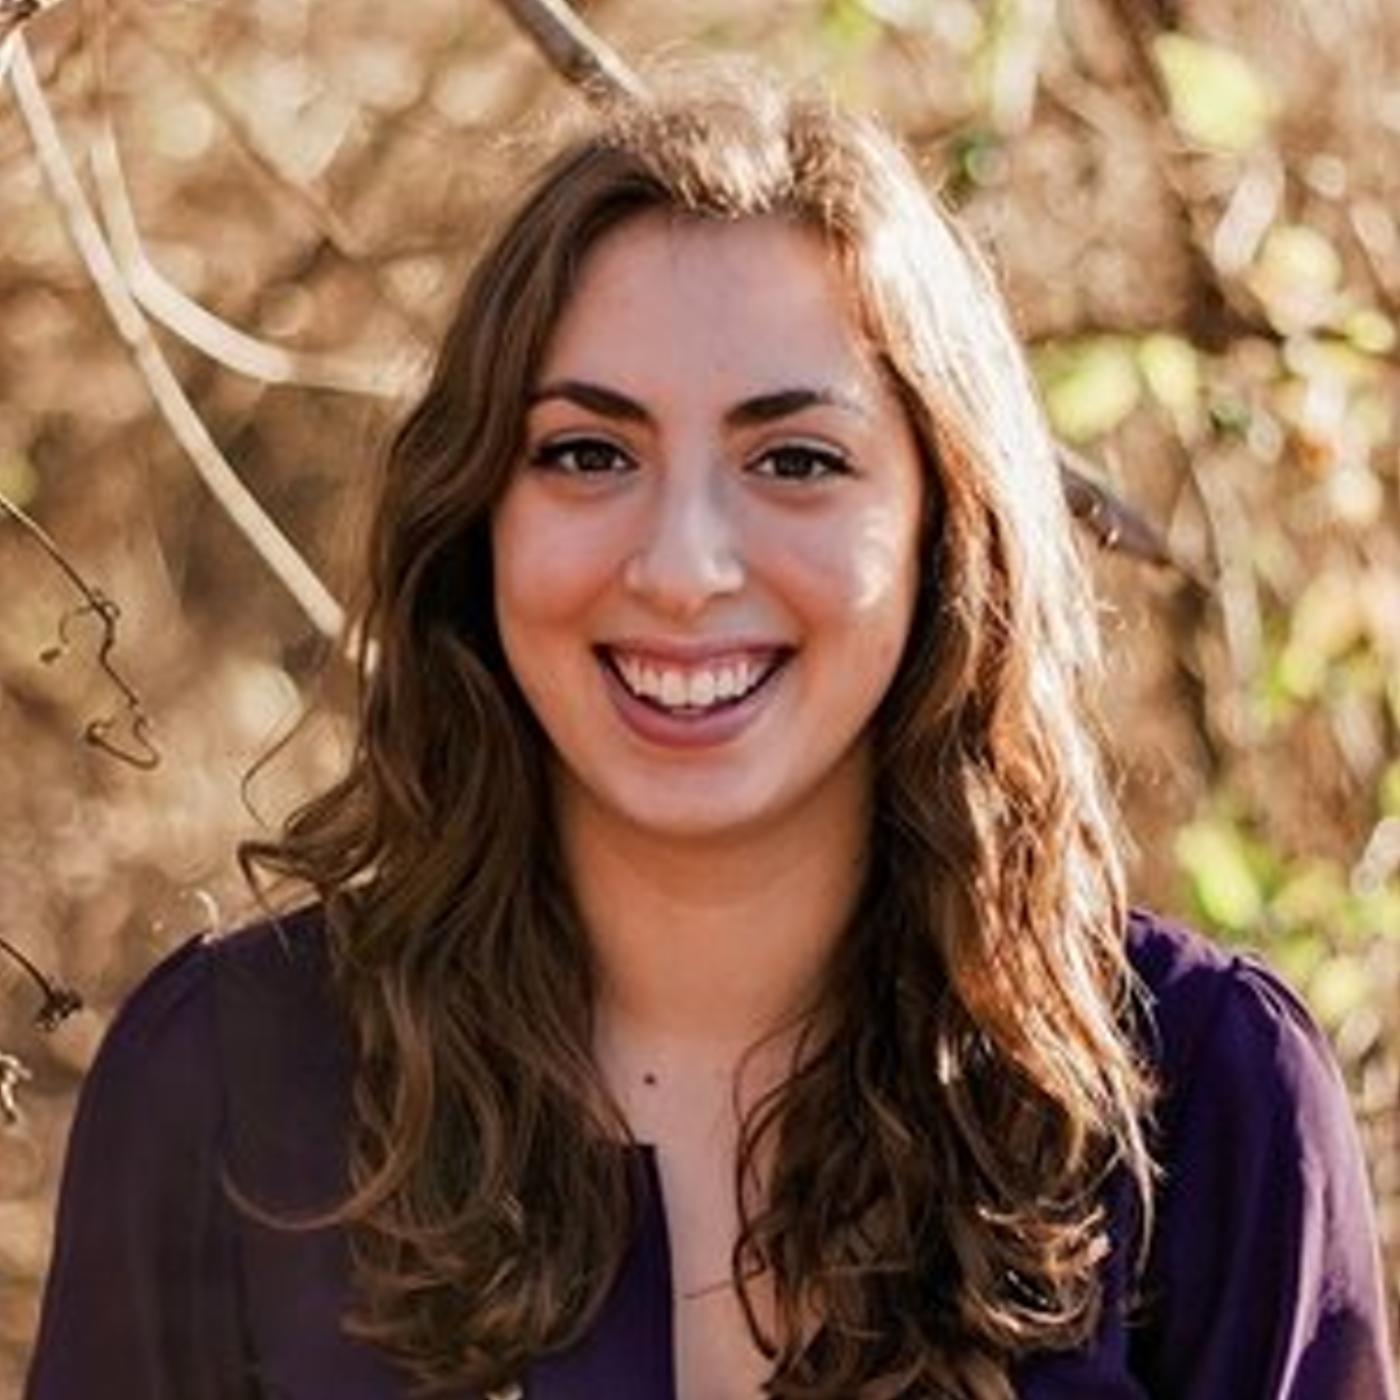 Ep. 14 Julia Levine: Theatre Artist Investigates Food, Climate, and Justice